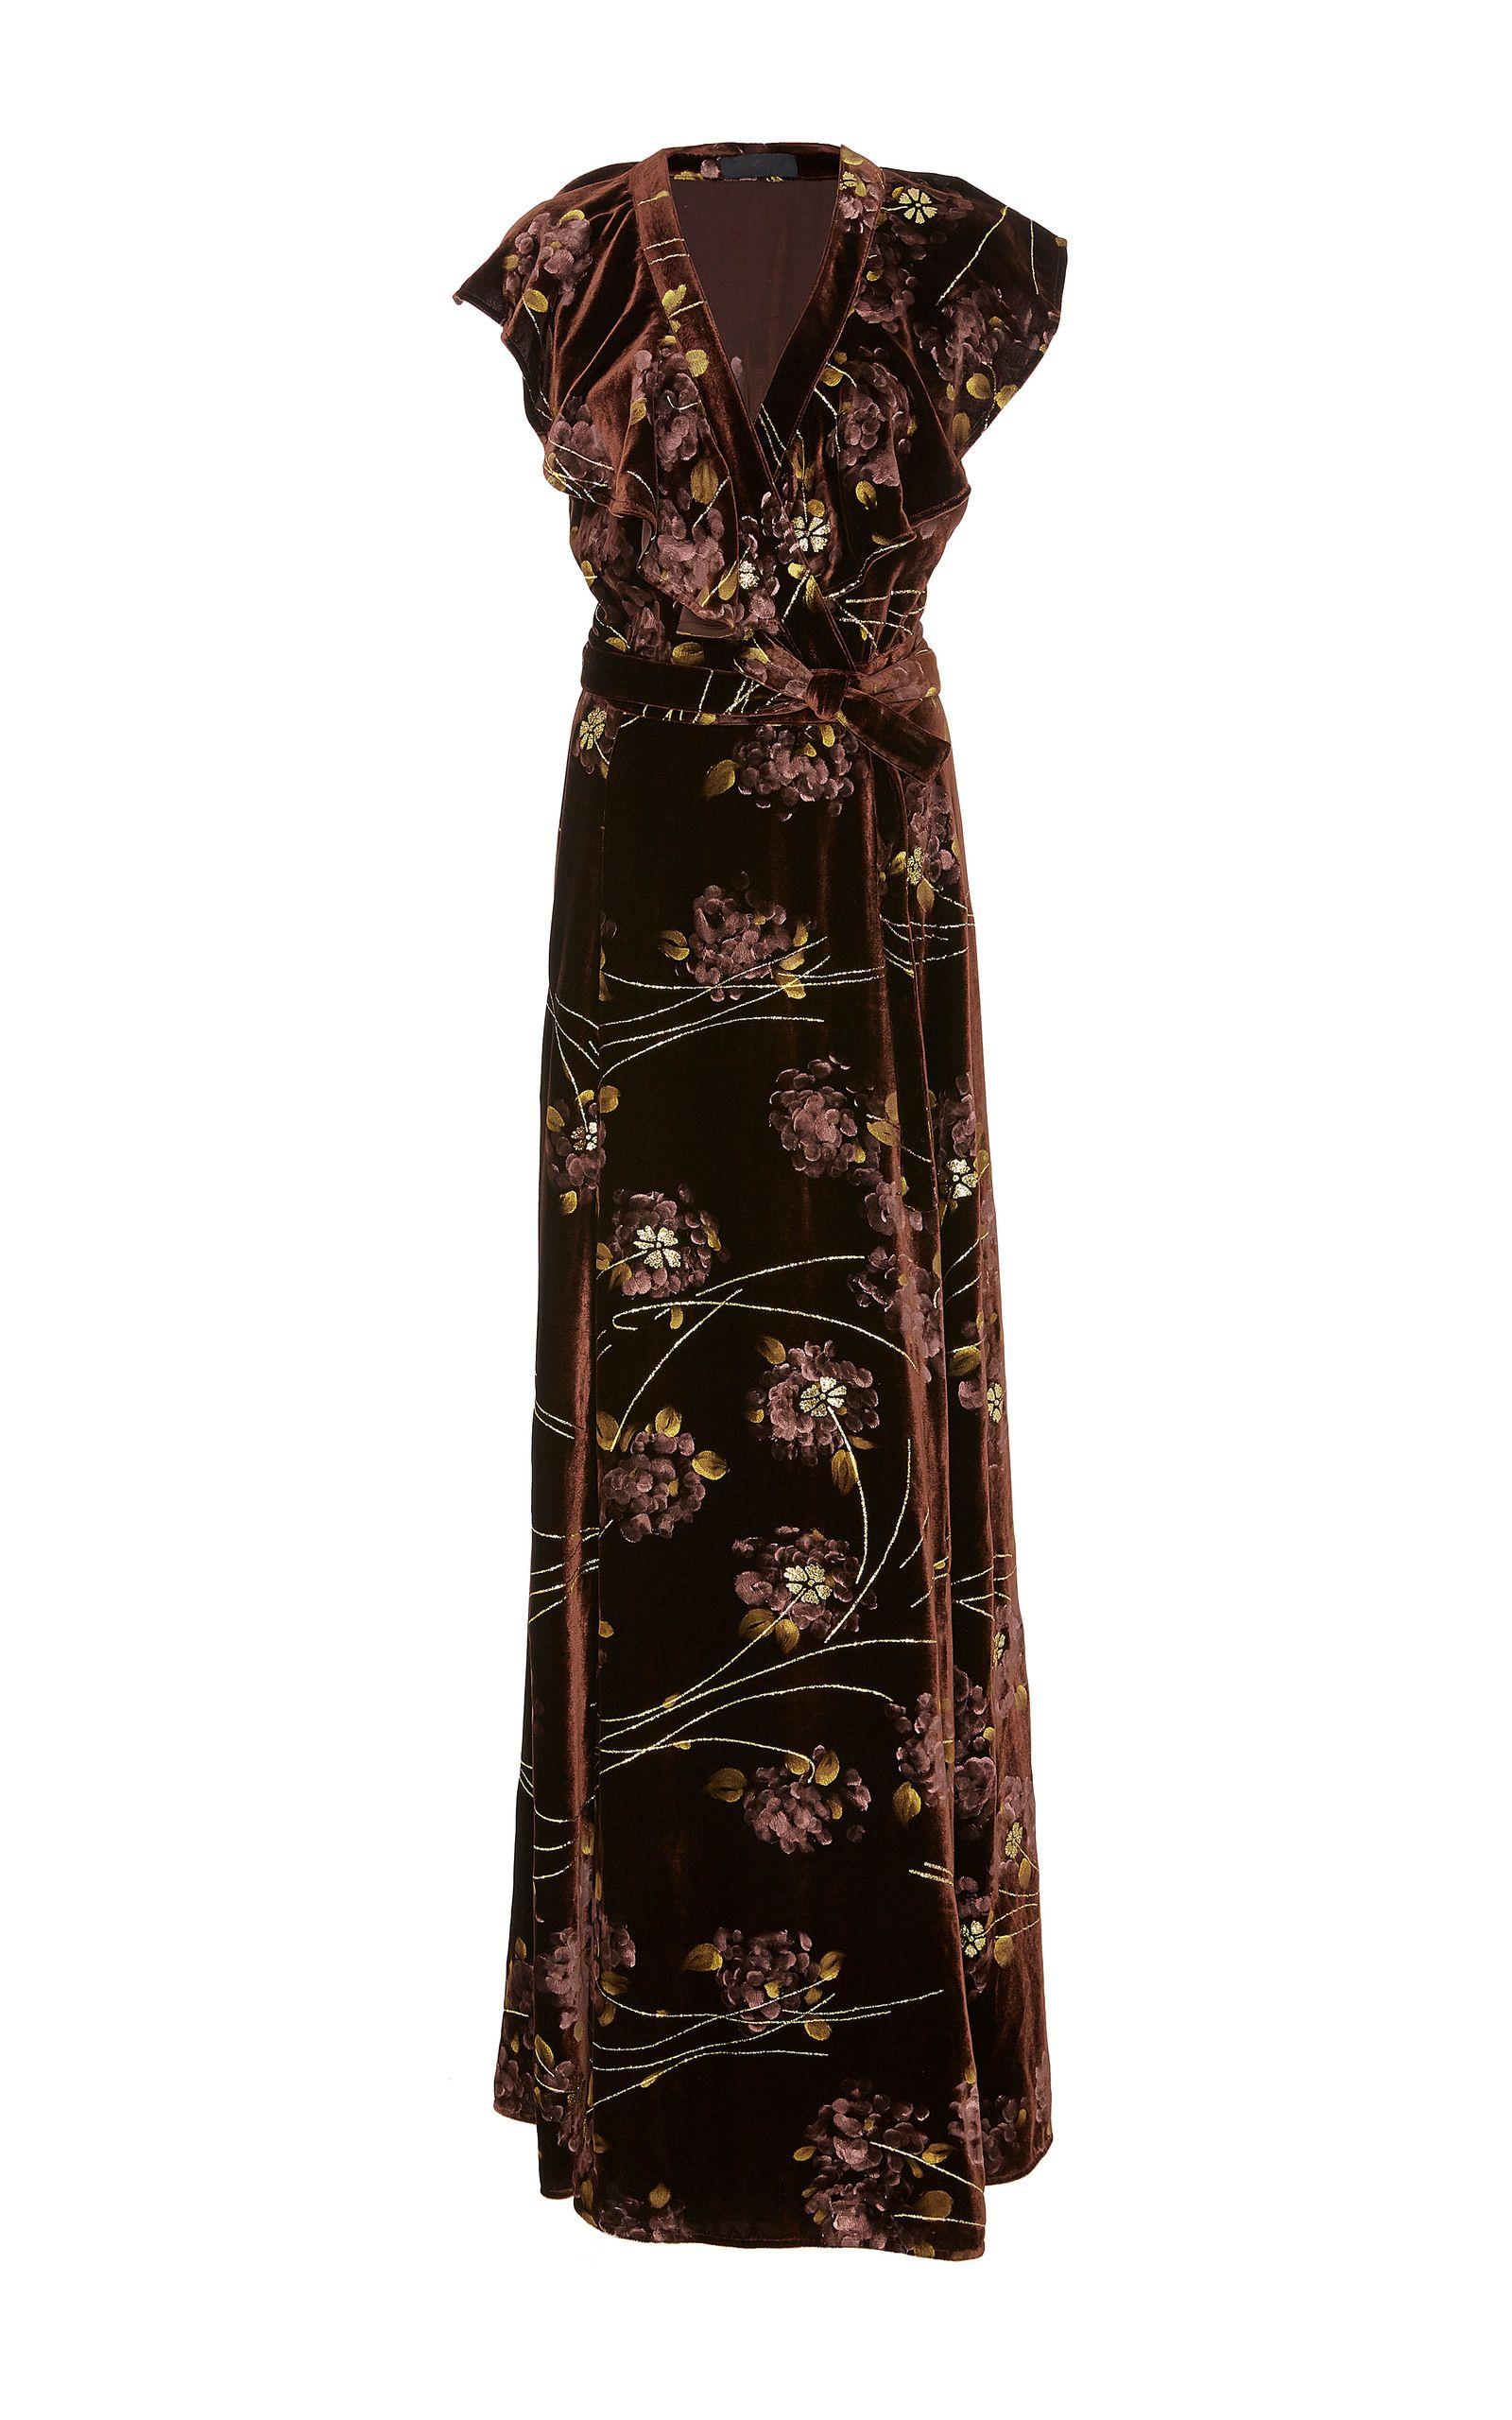 Painted velvet dress by co beautiful dresses pinterest dress